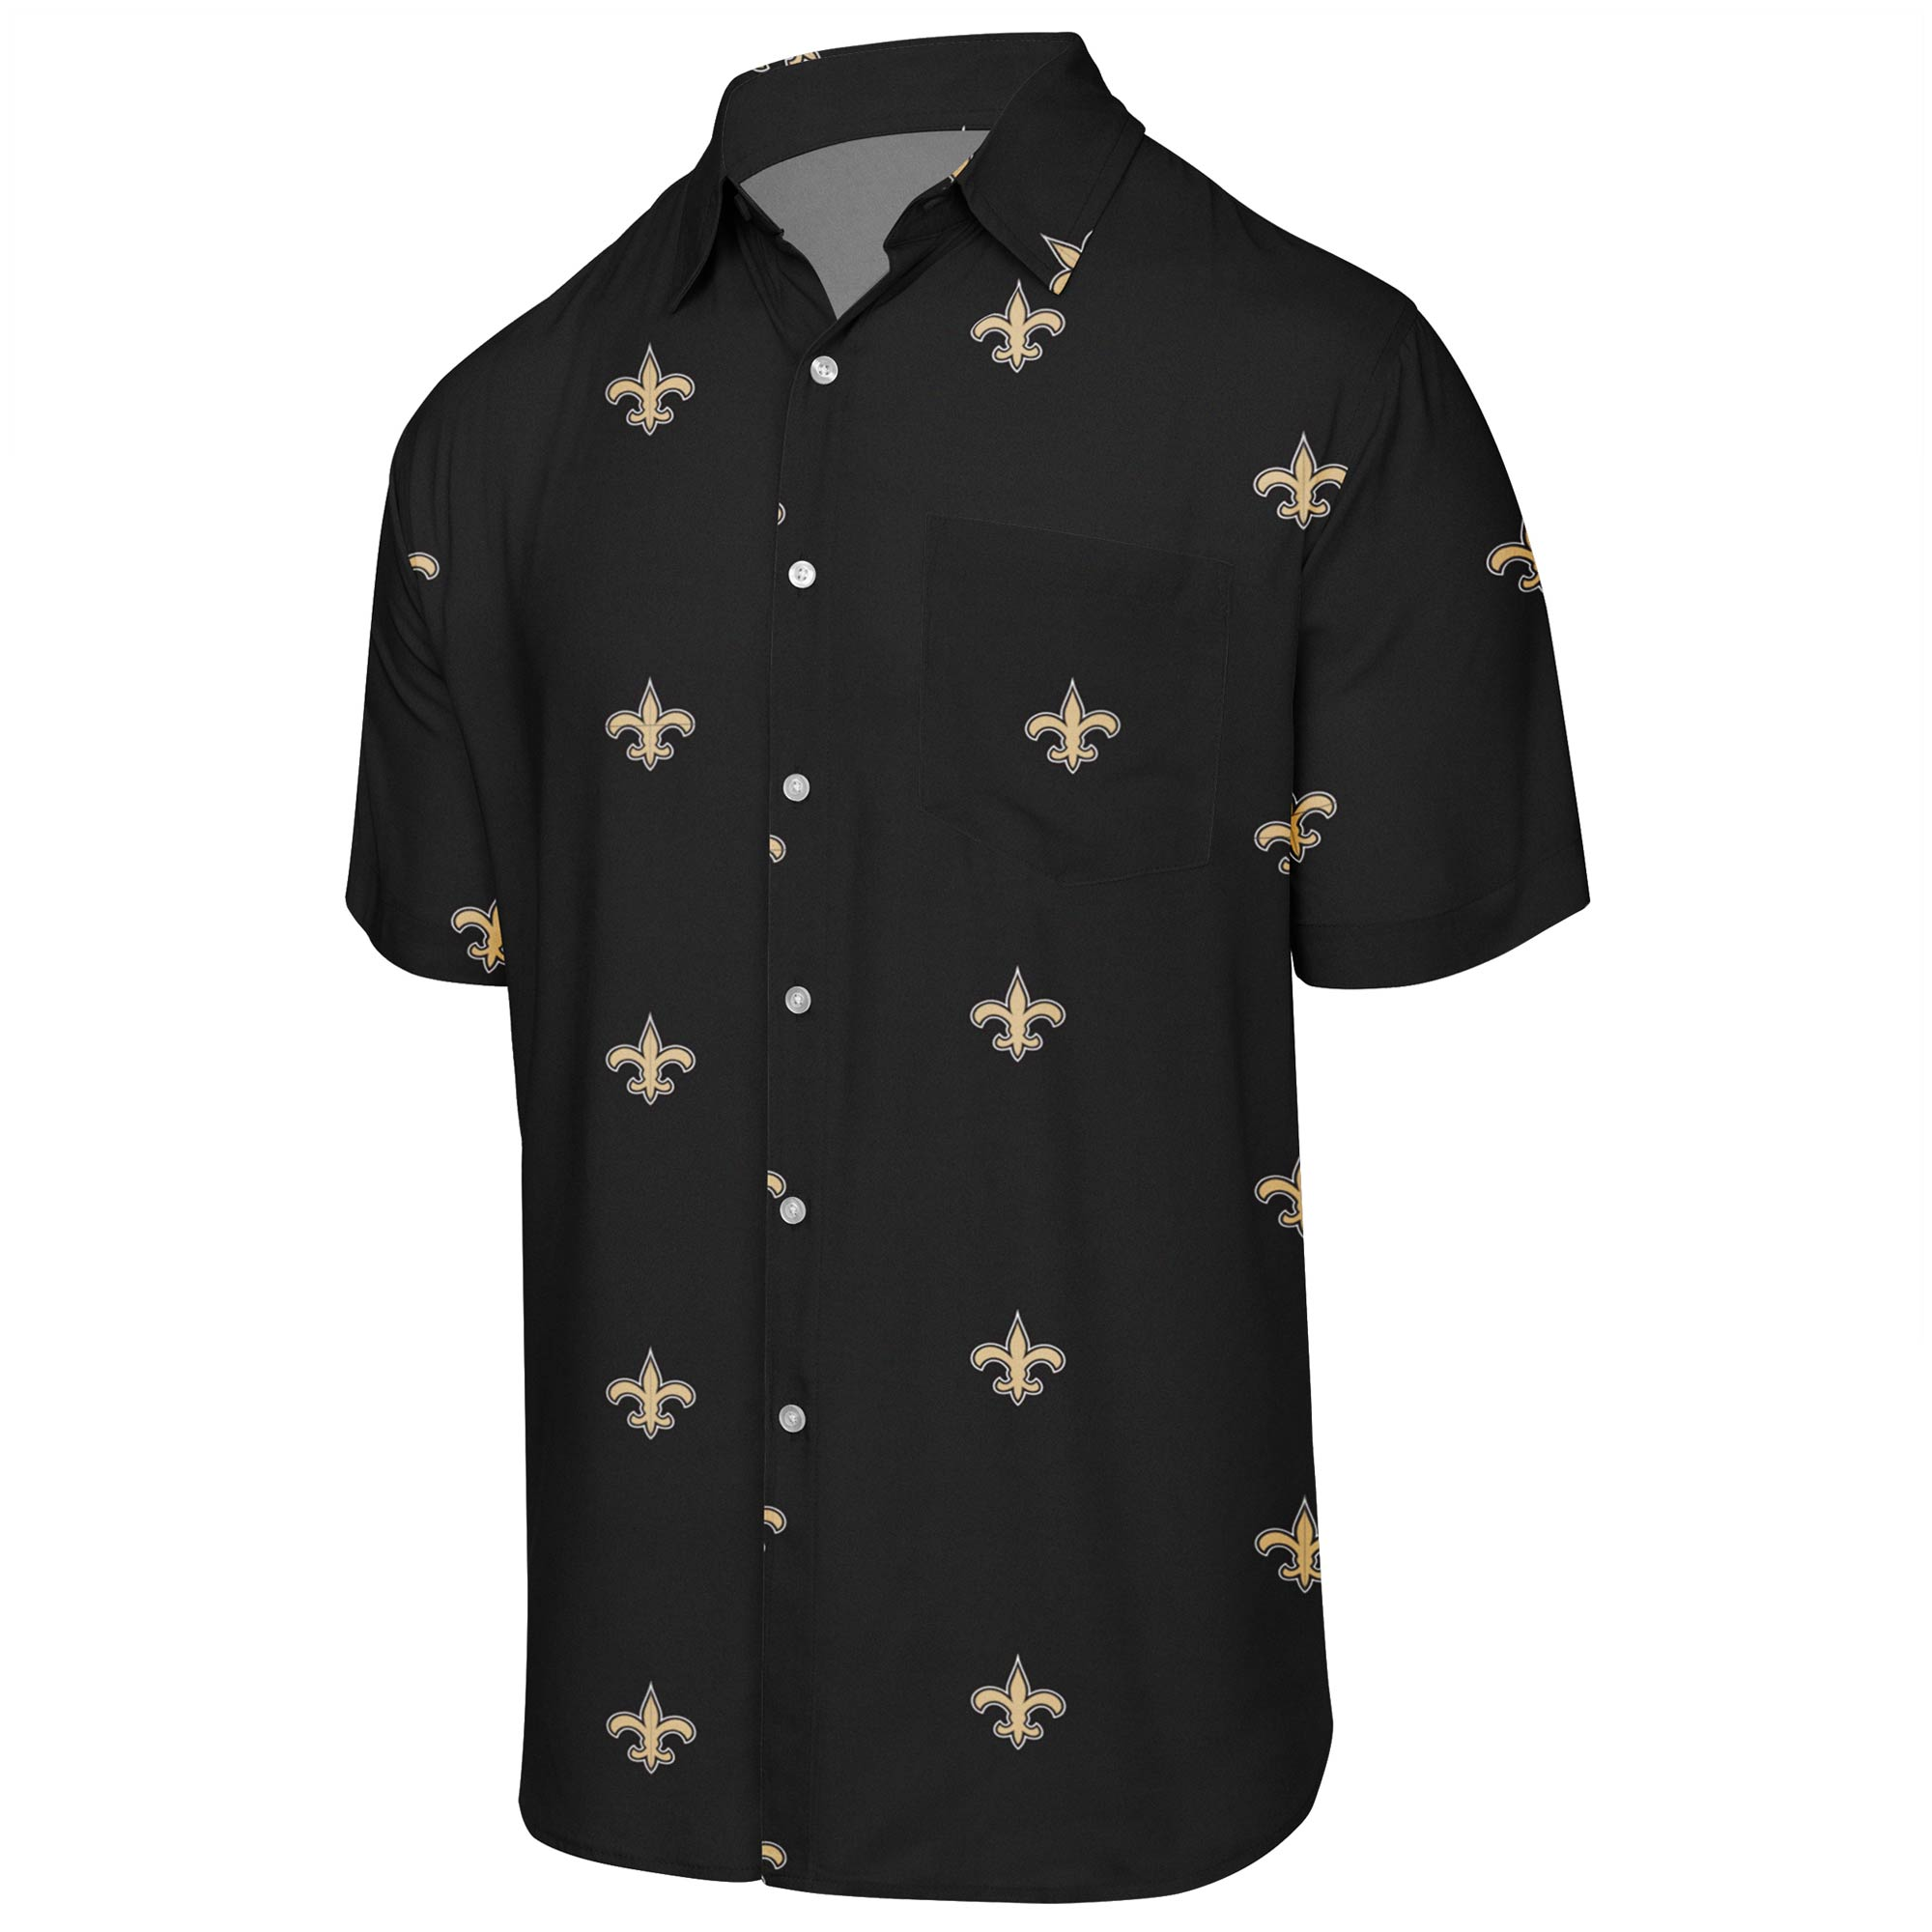 New Orleans Saints Mini Print Logo Woven Button-Up Shirt - Black